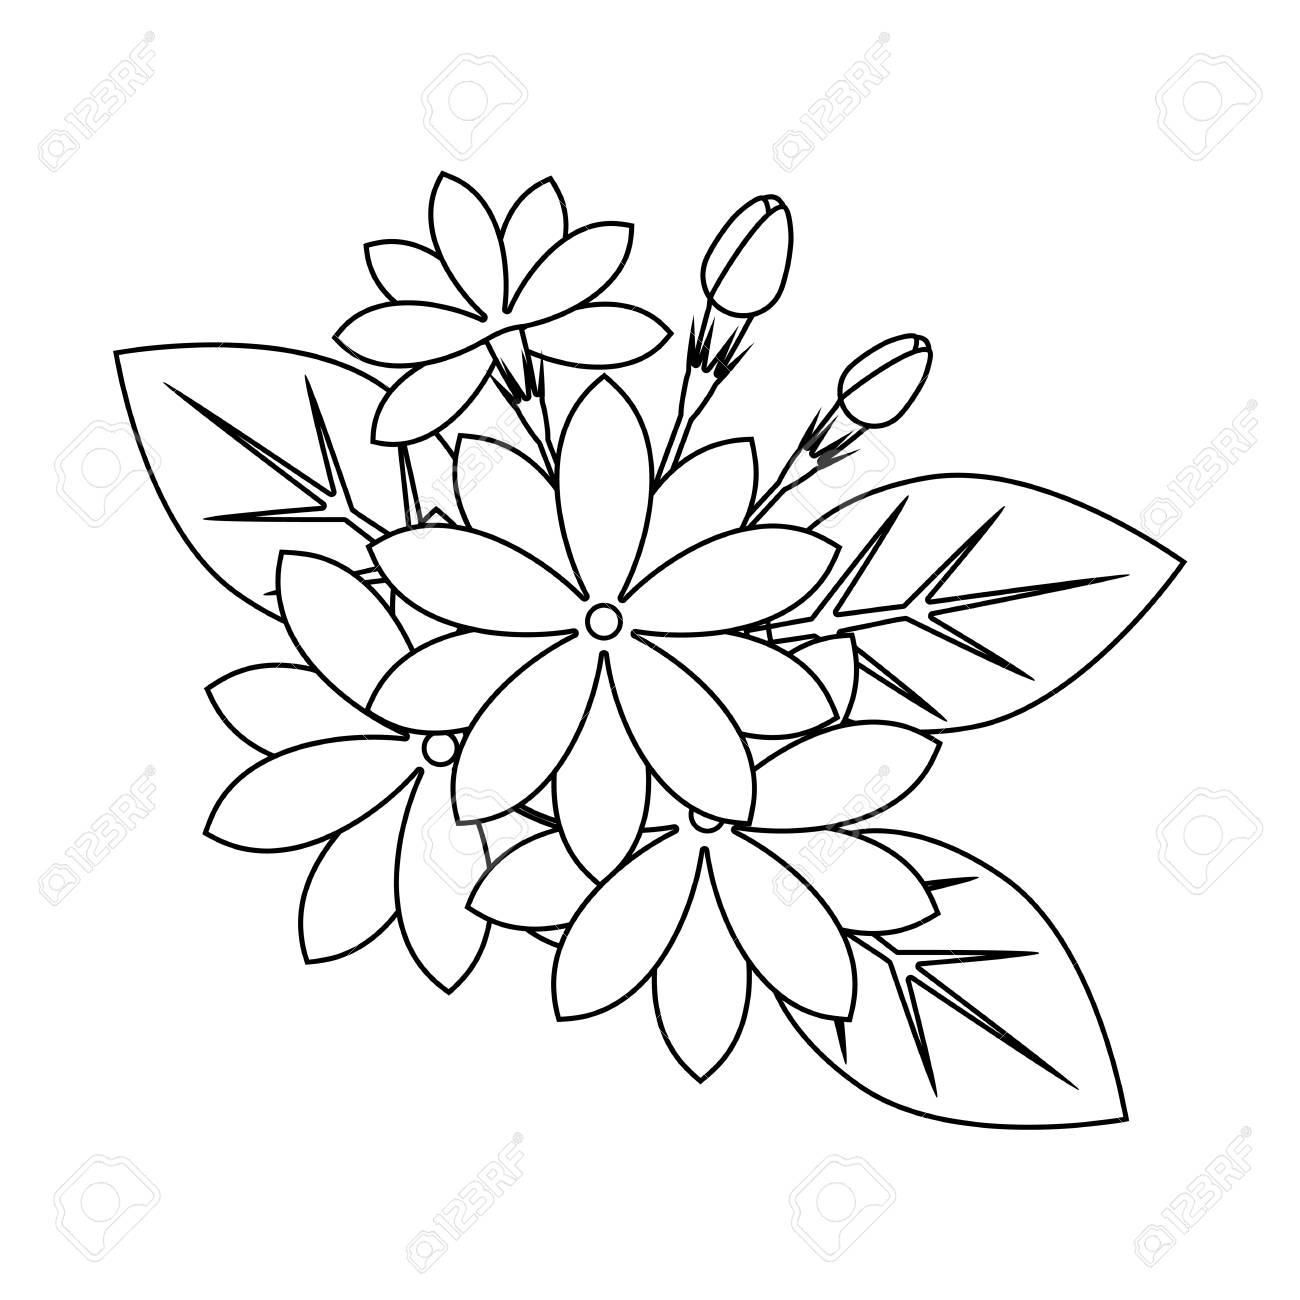 Flower Drawing Pinterest | Free download best Flower Drawing ...